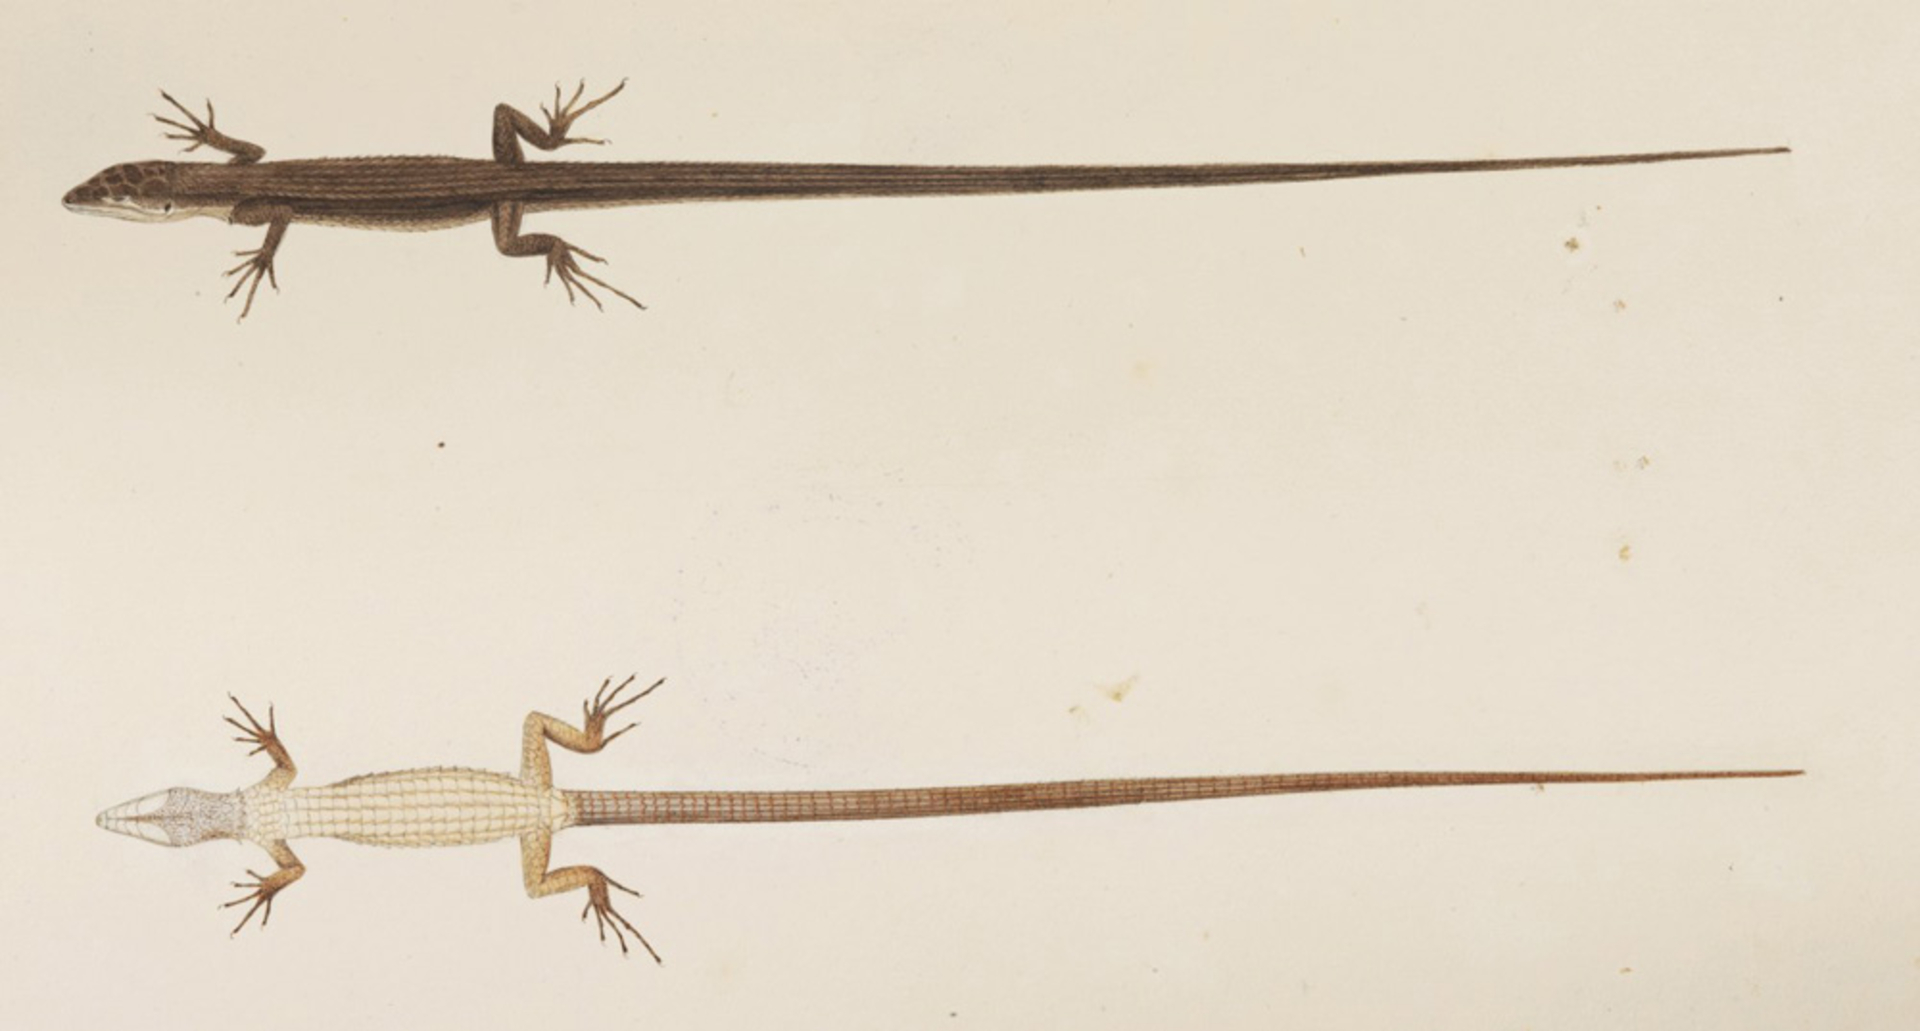 RMNH.ART.271 | Takydromus tachydromoides